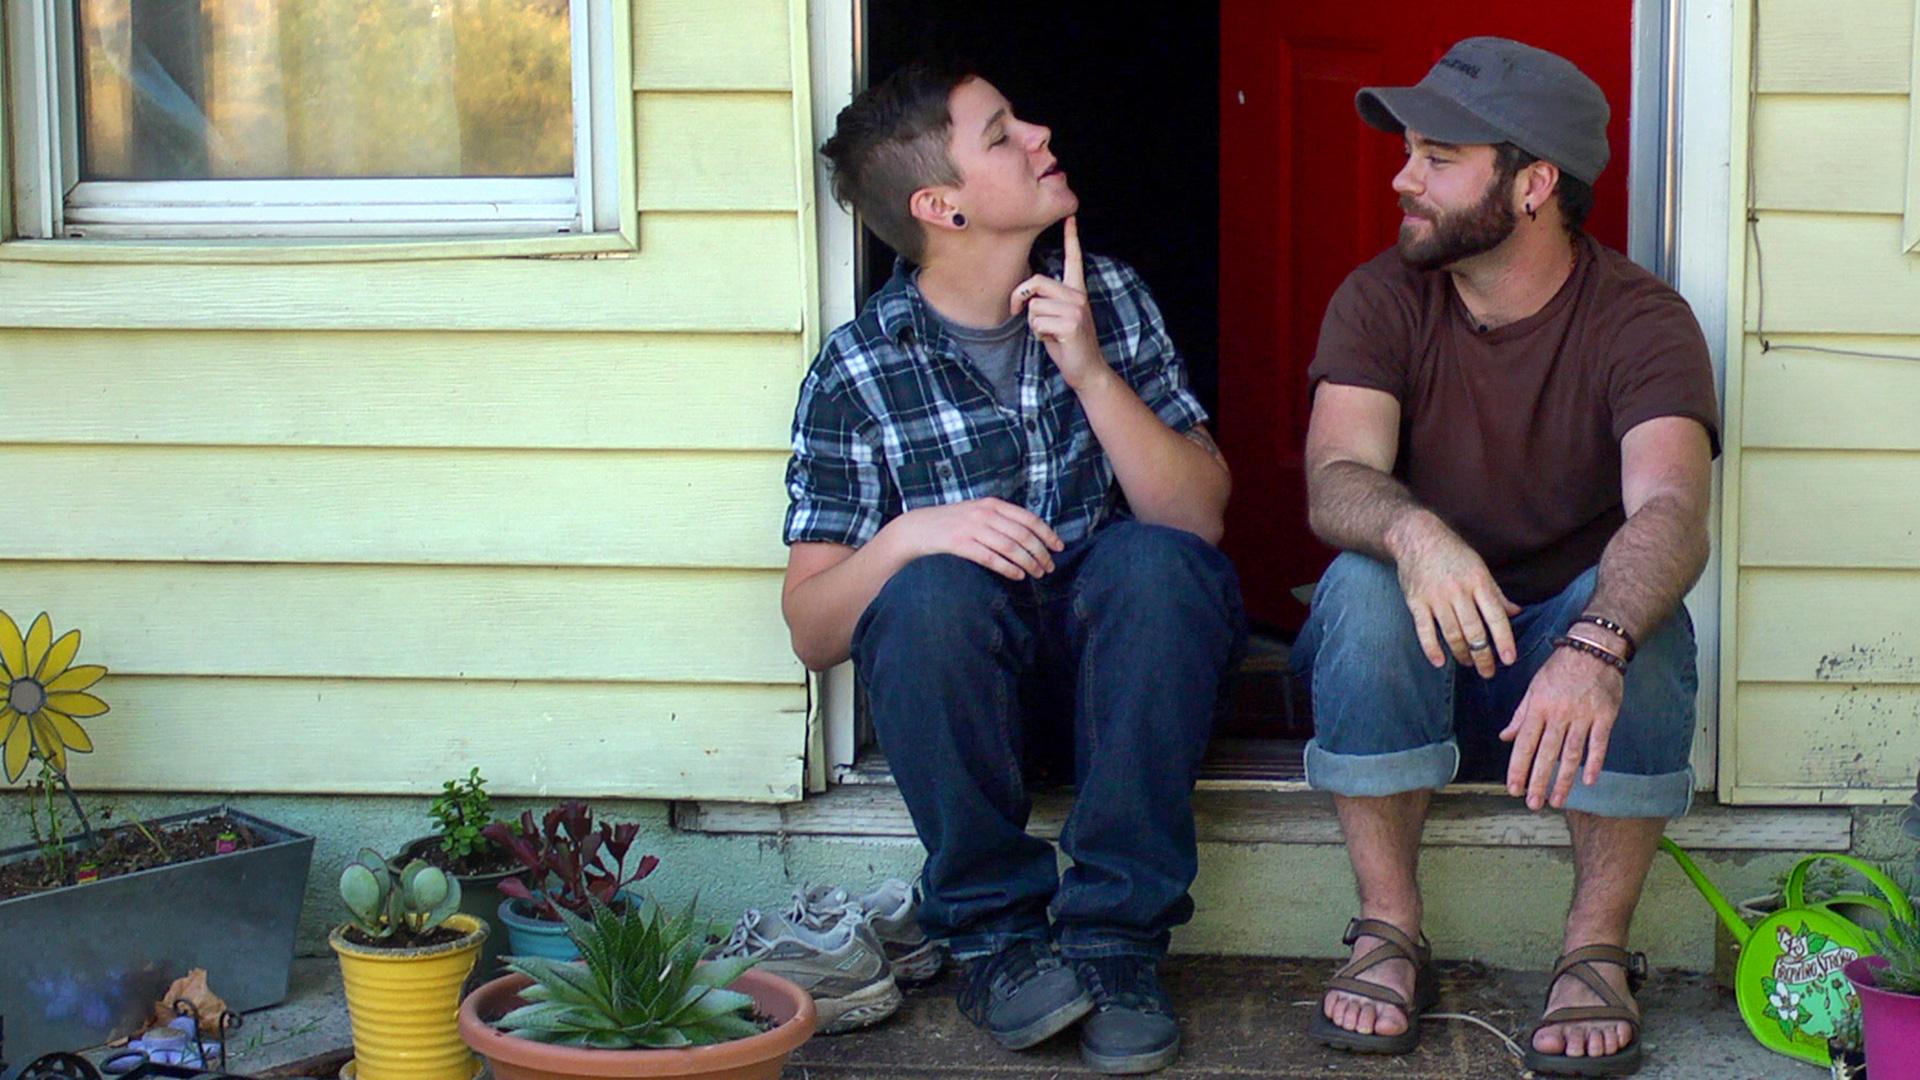 Trans teen Bennett shows his first chin hair to his friend and mentor, Joe Stevens.